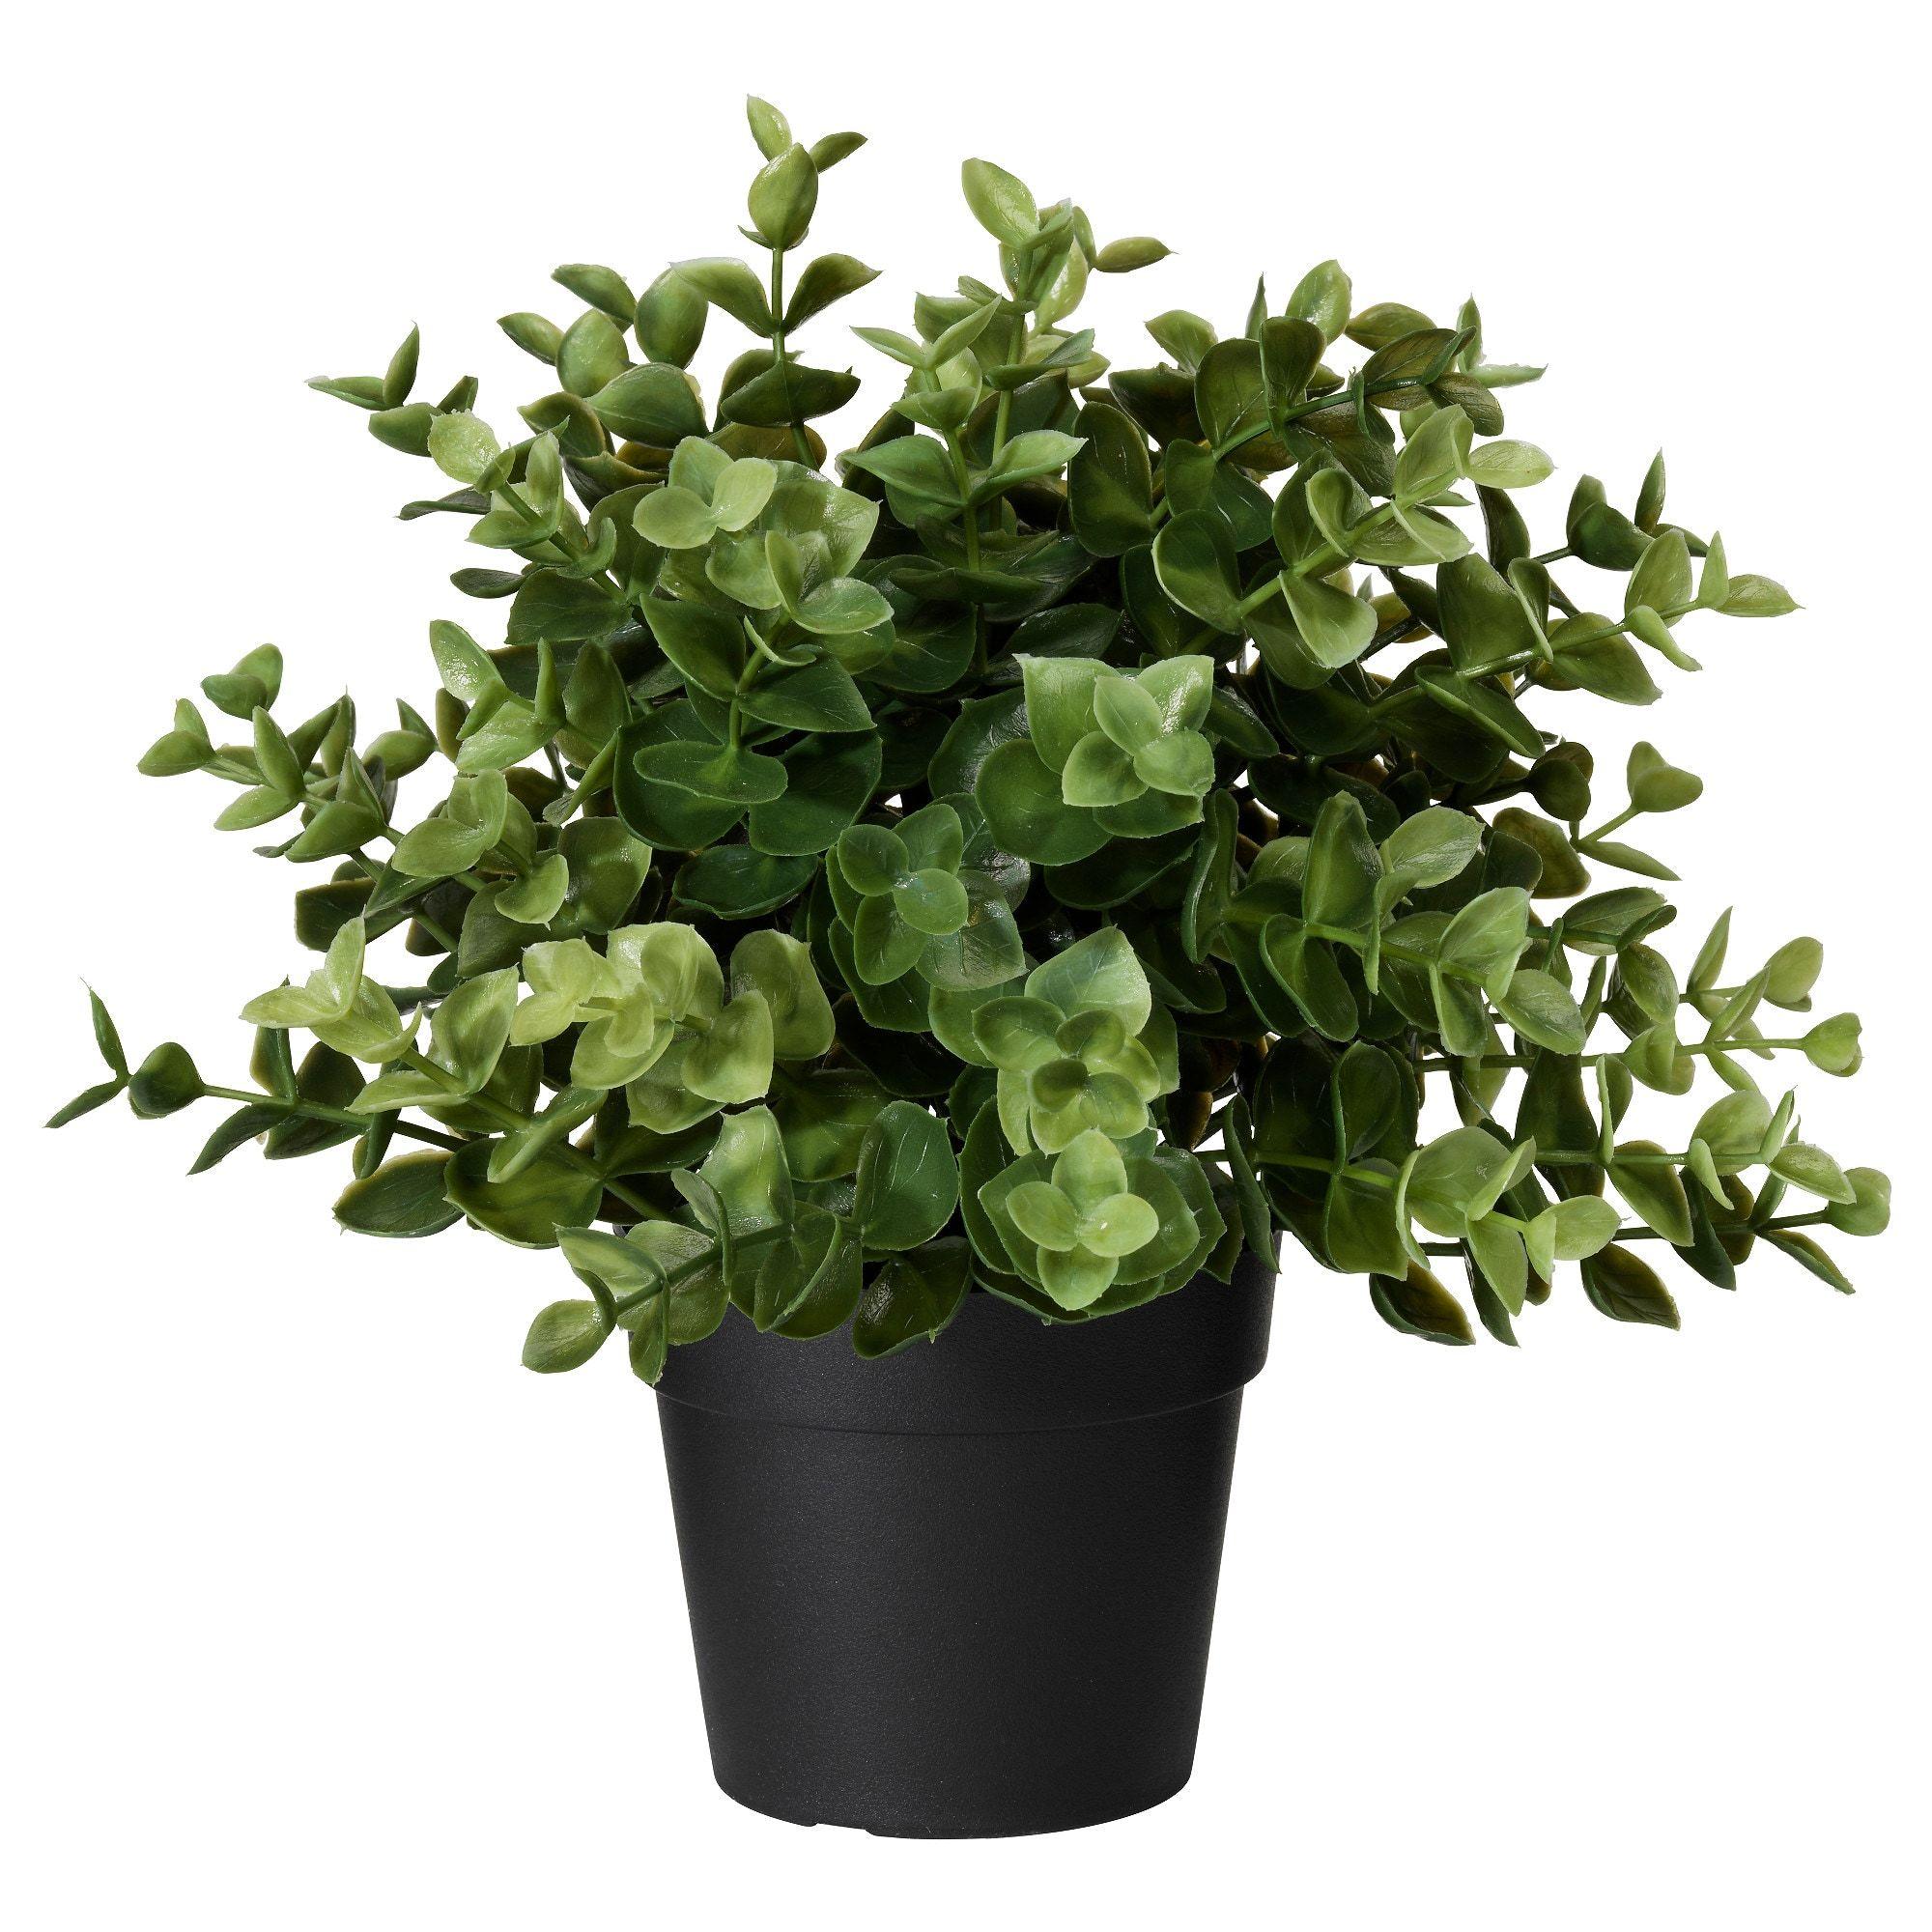 Fejka Plante Artificielle En Pot Origan Ikea Artificial Potted Plants Small Artificial Plants Artificial Plant Wall